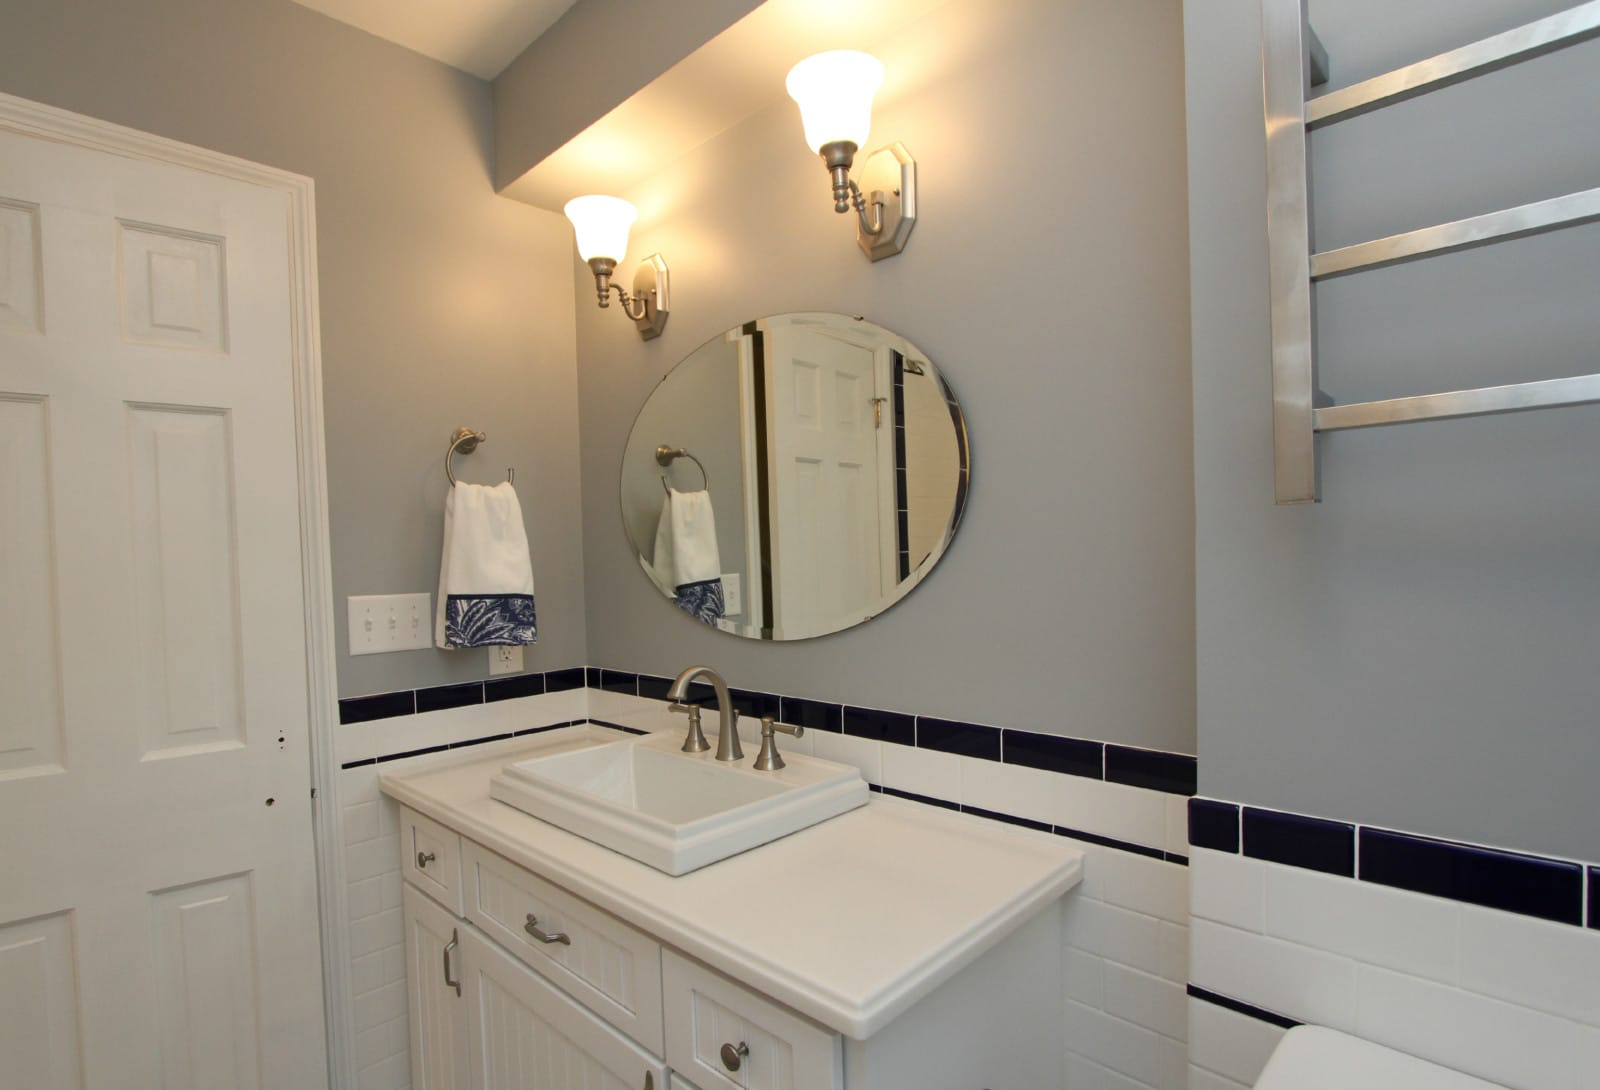 Bathroom Remodeling Sinks That Work Taylor Made Custom Contractors - Licensed bathroom contractors